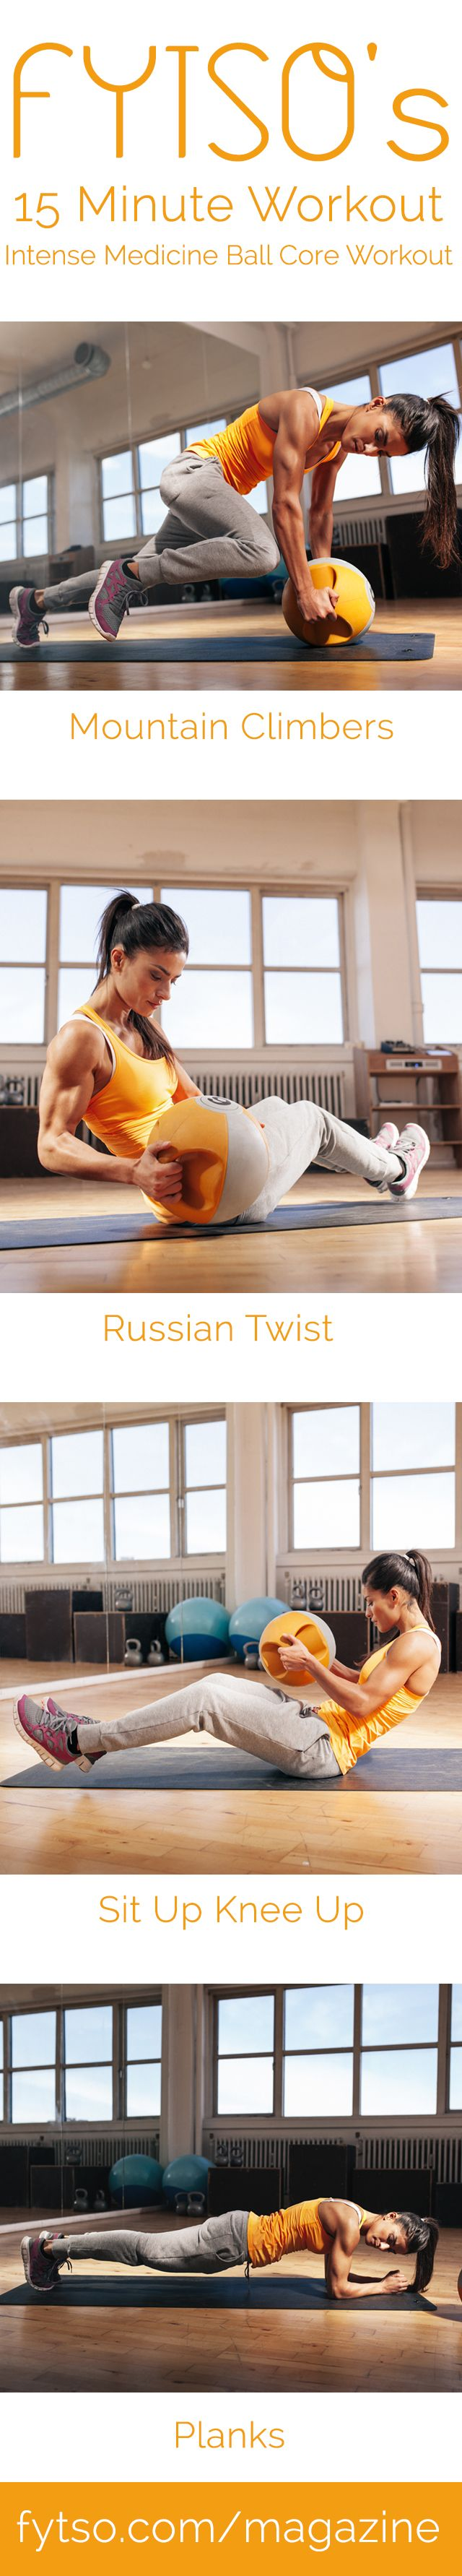 15 Minute Workout – Intense Medicine Ball Core Workout